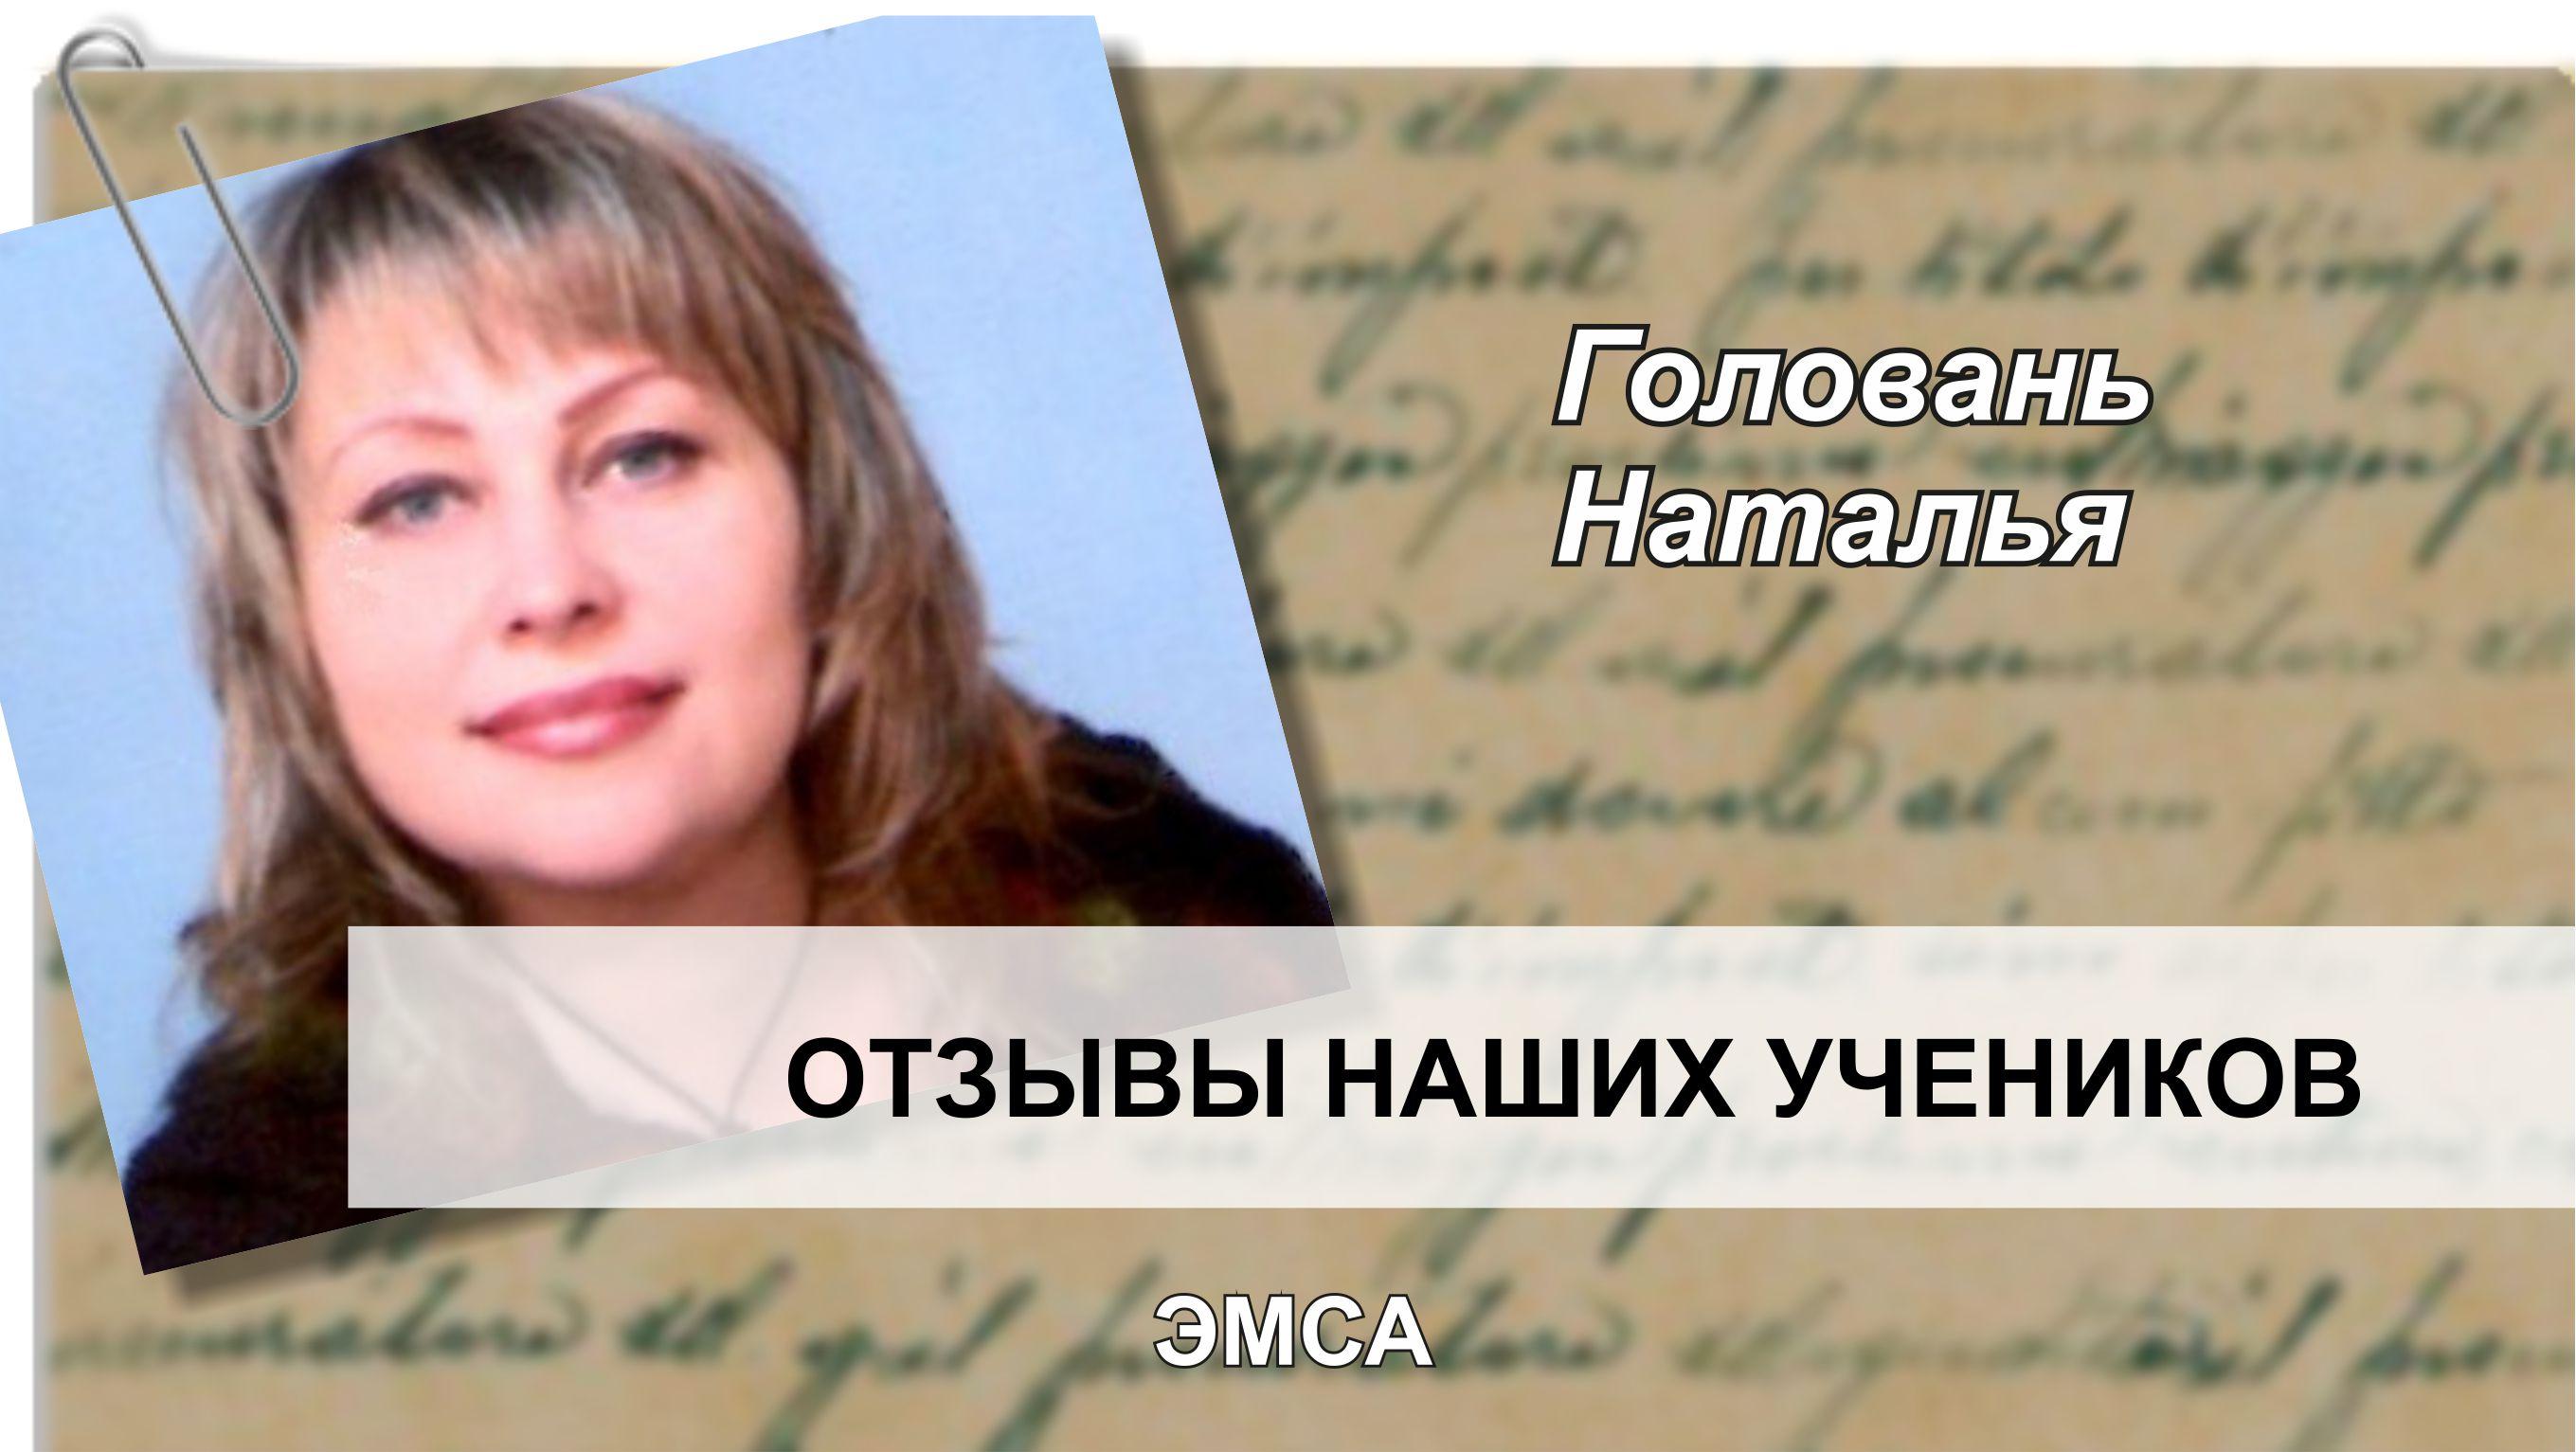 Головань Наталья отзыв ЭМСА